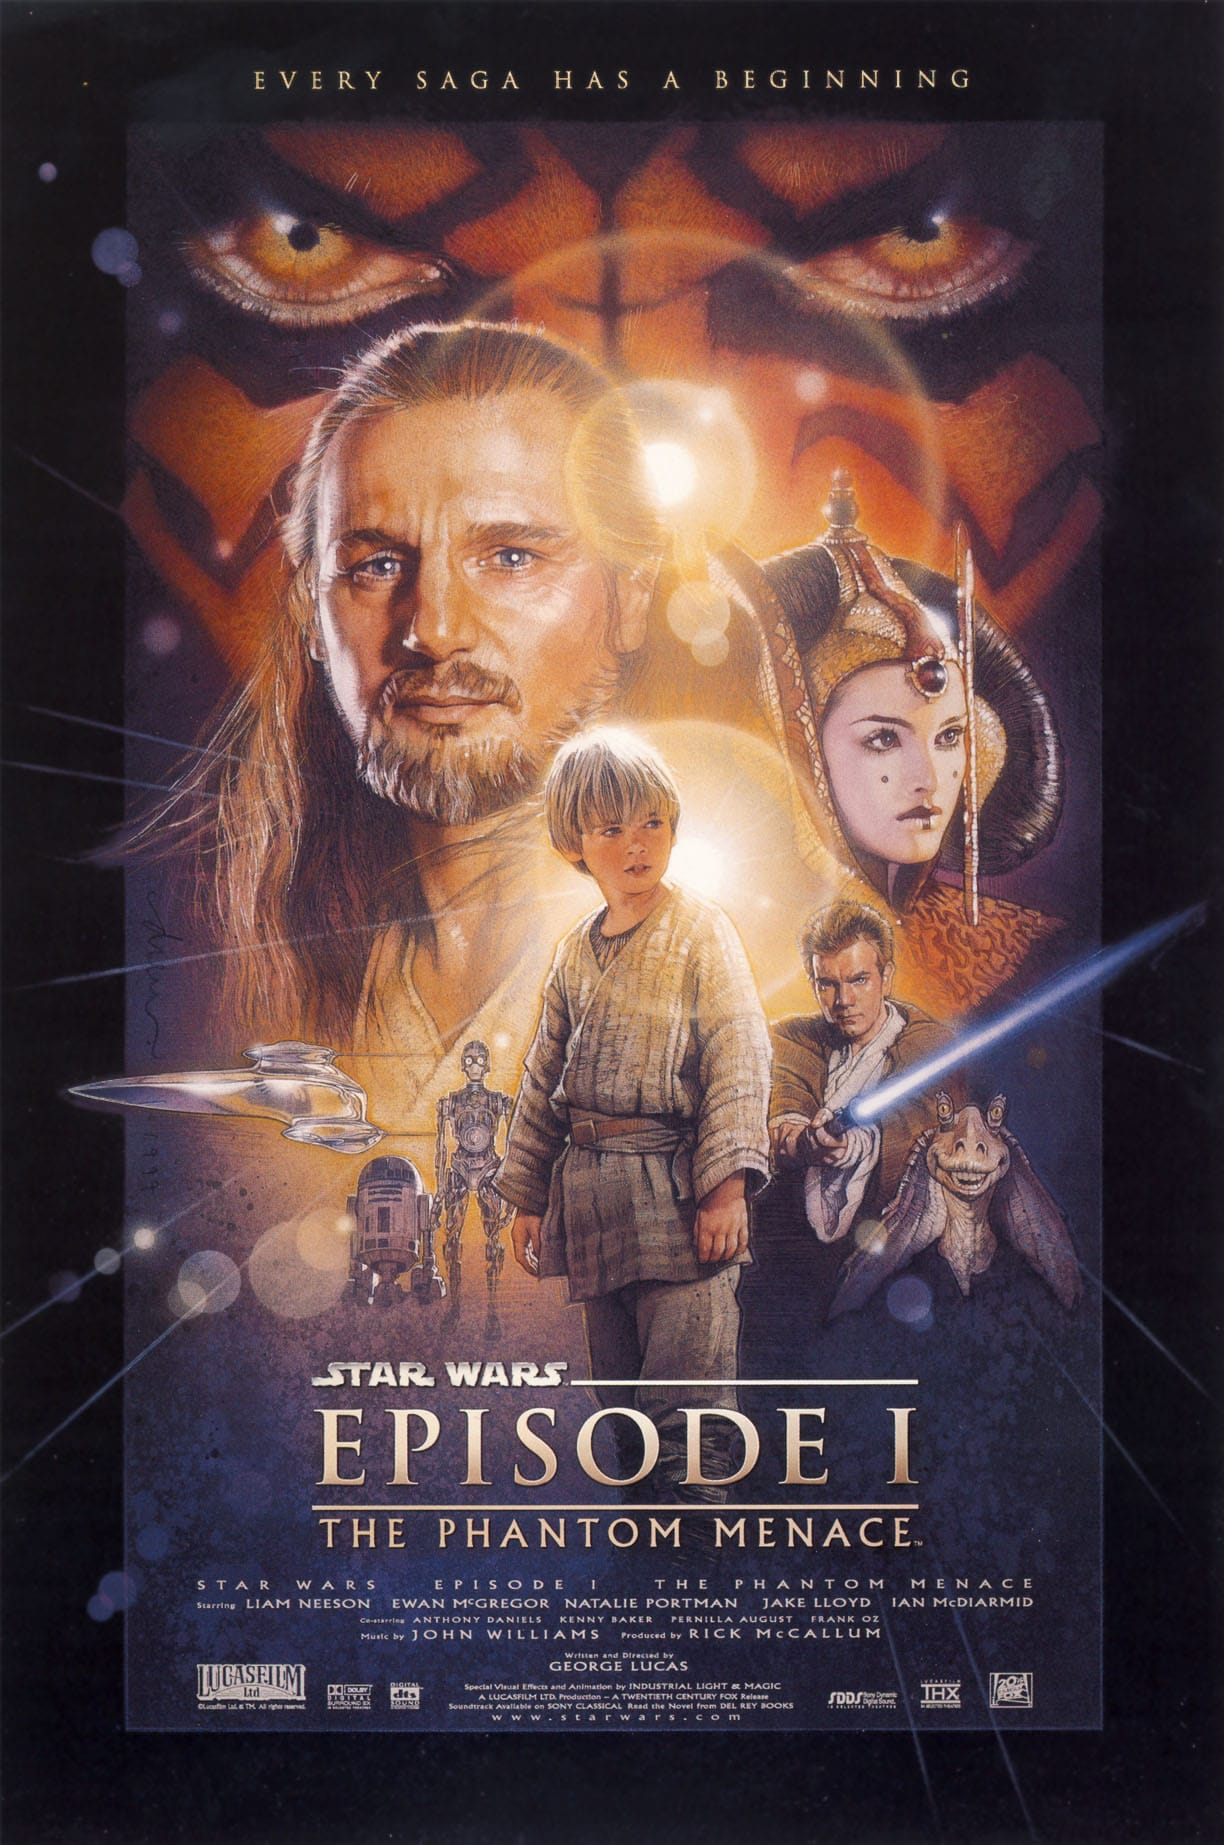 star wars hd printable poster wallpaper episode 1 the phantom menace